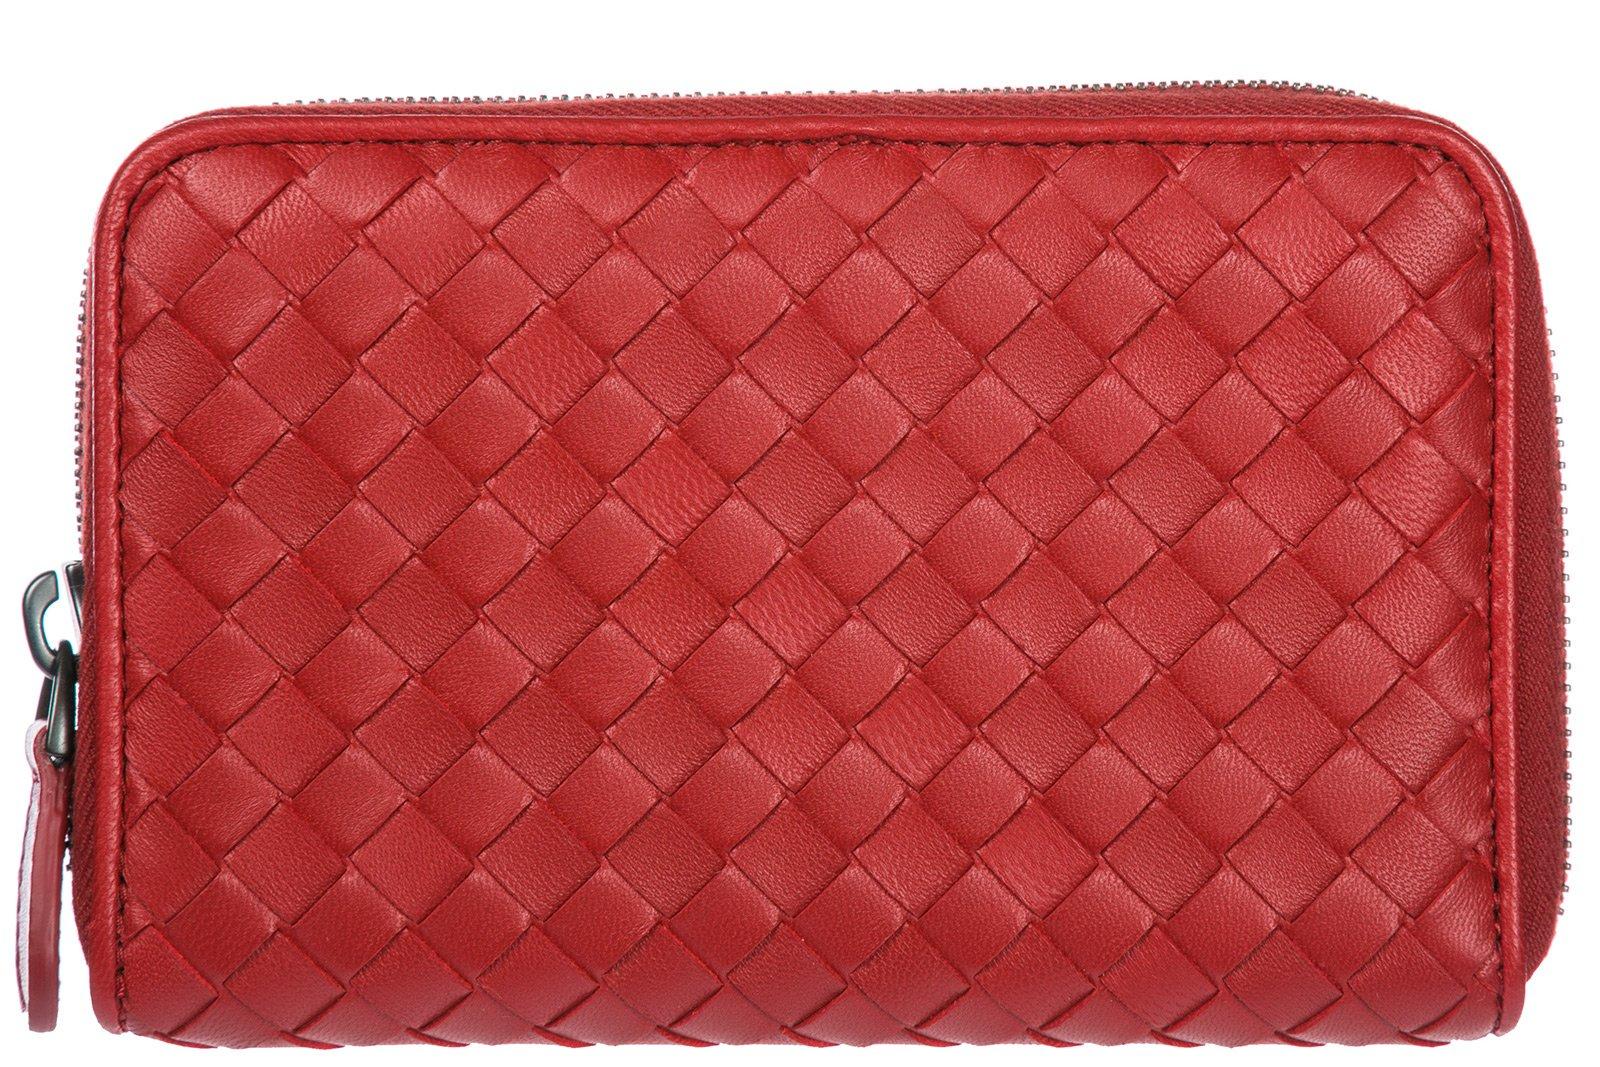 Bottega Veneta women's wallet leather coin case holder purse card bifold red